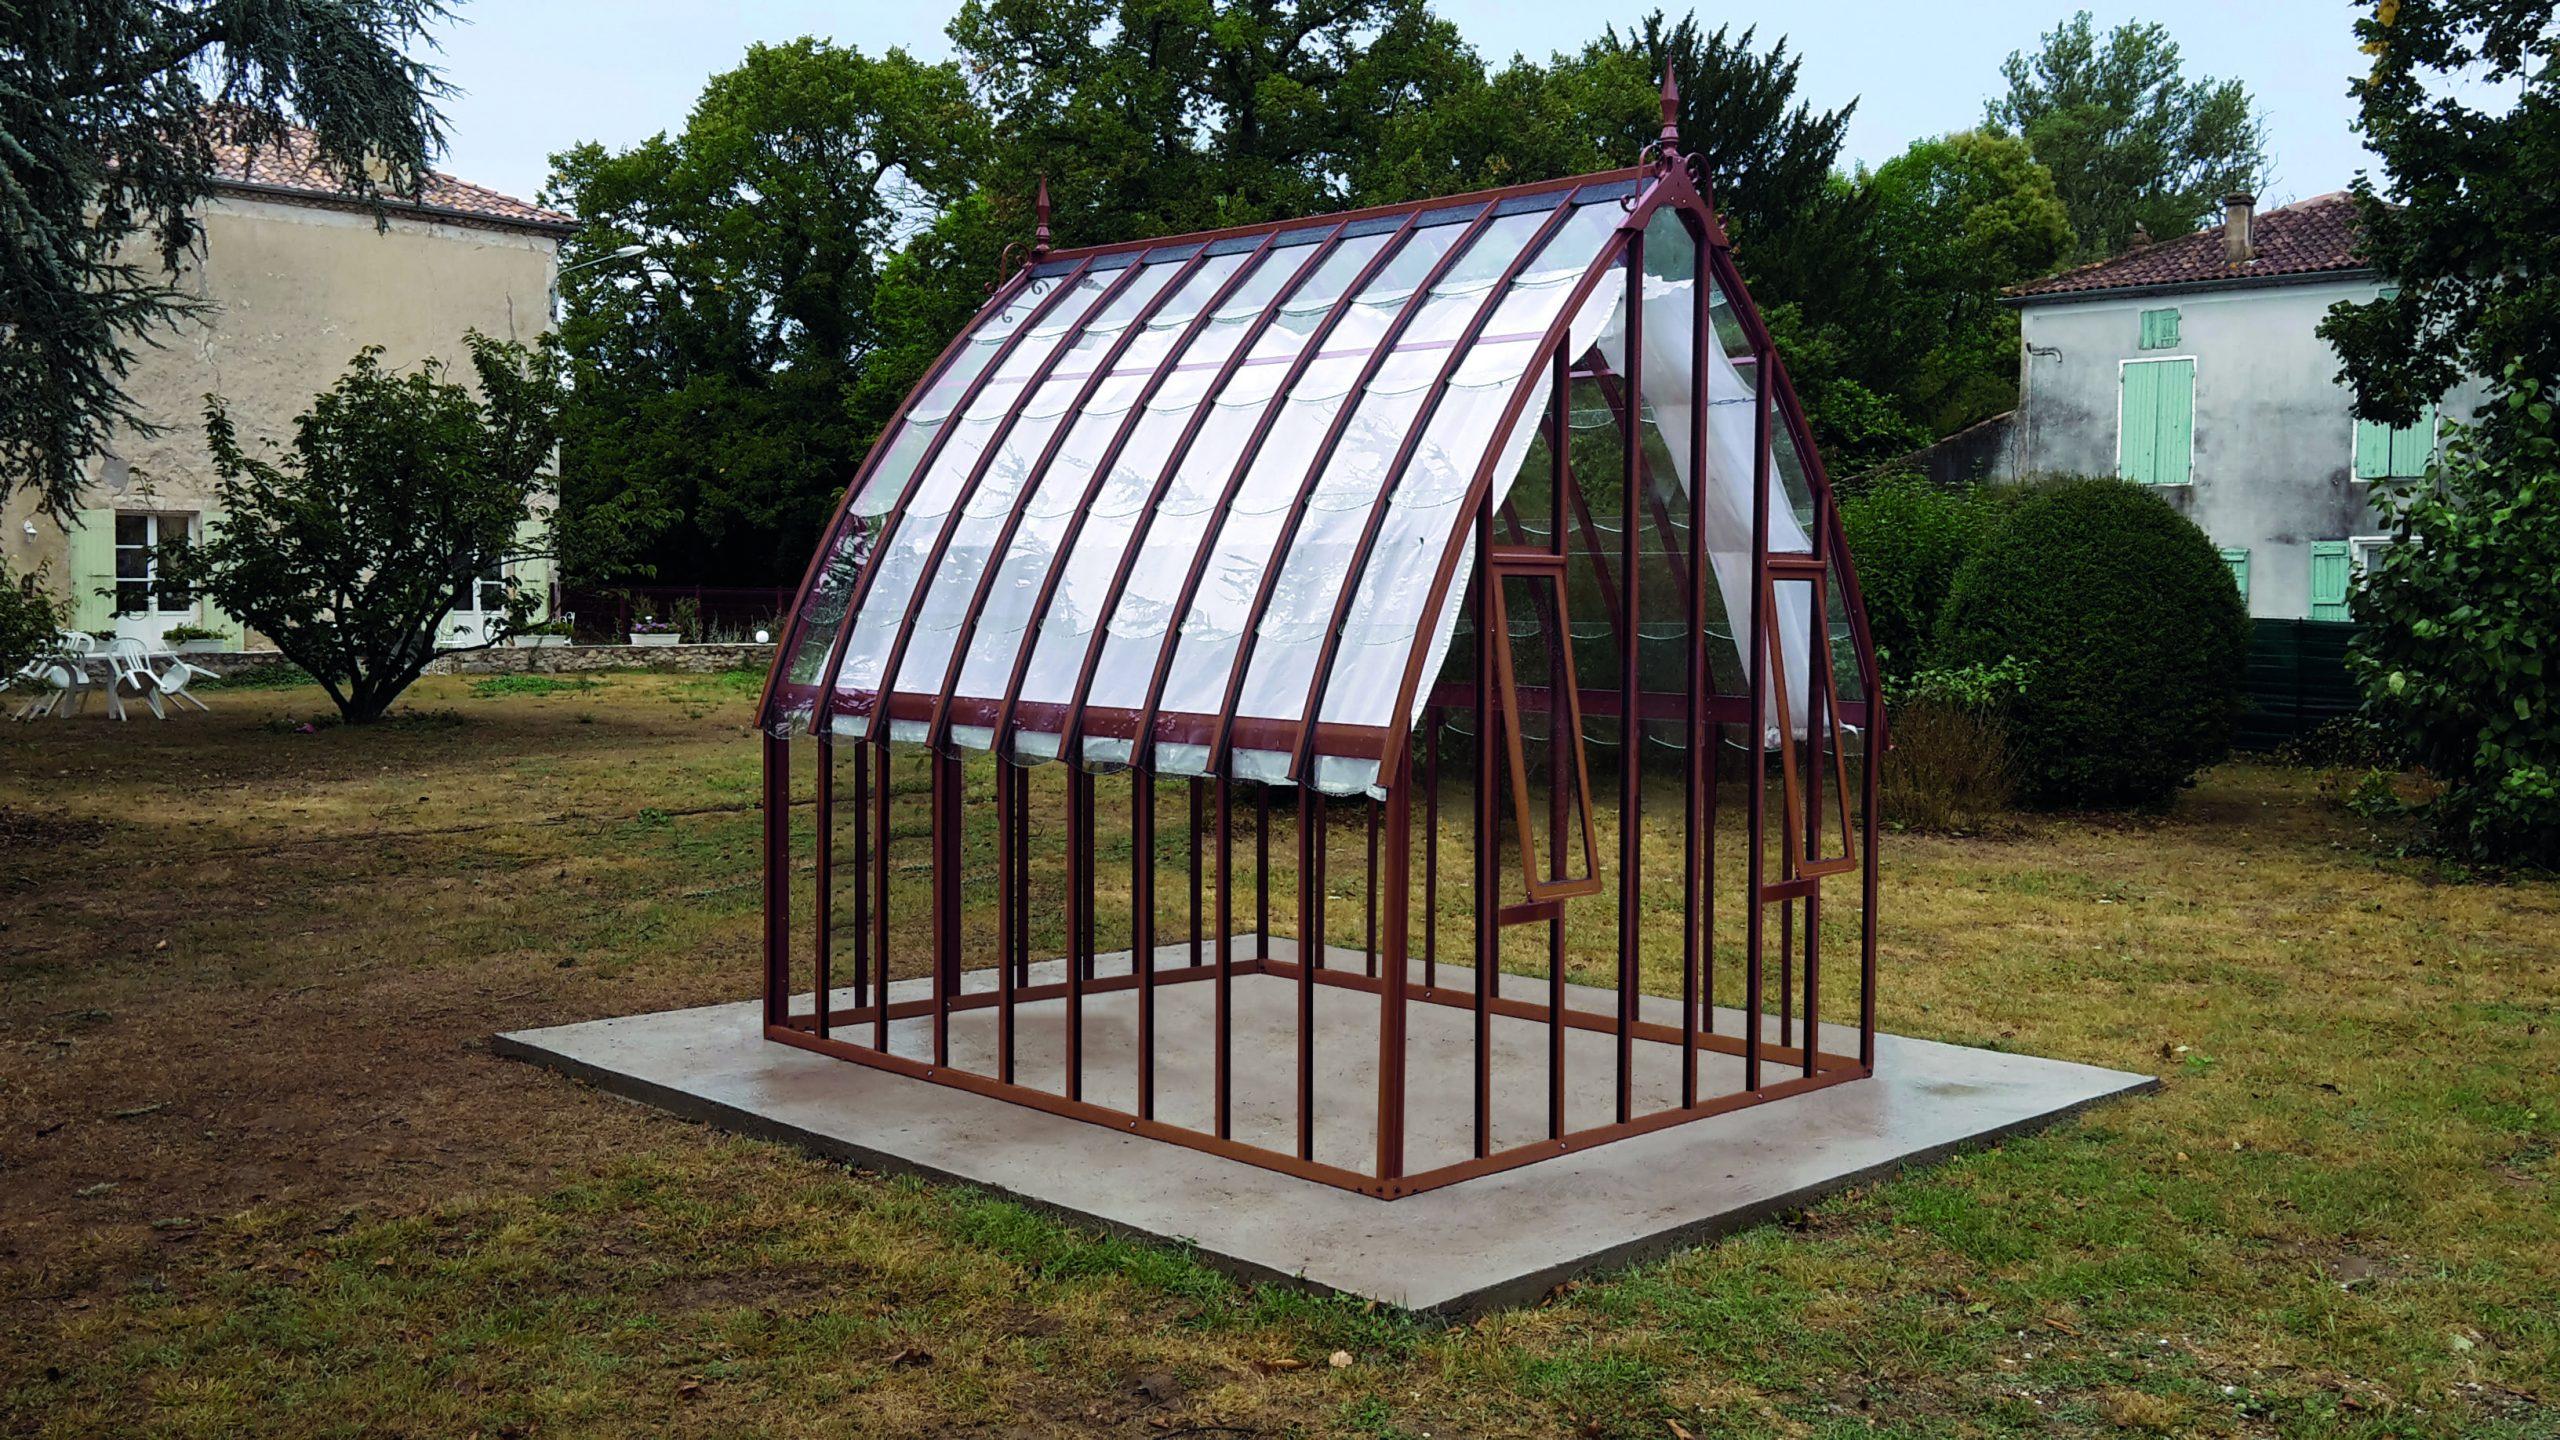 Serre À L'ancienne Style Fer Forgé - Aluminium - Verre ... destiné Serre Jardin Occasion